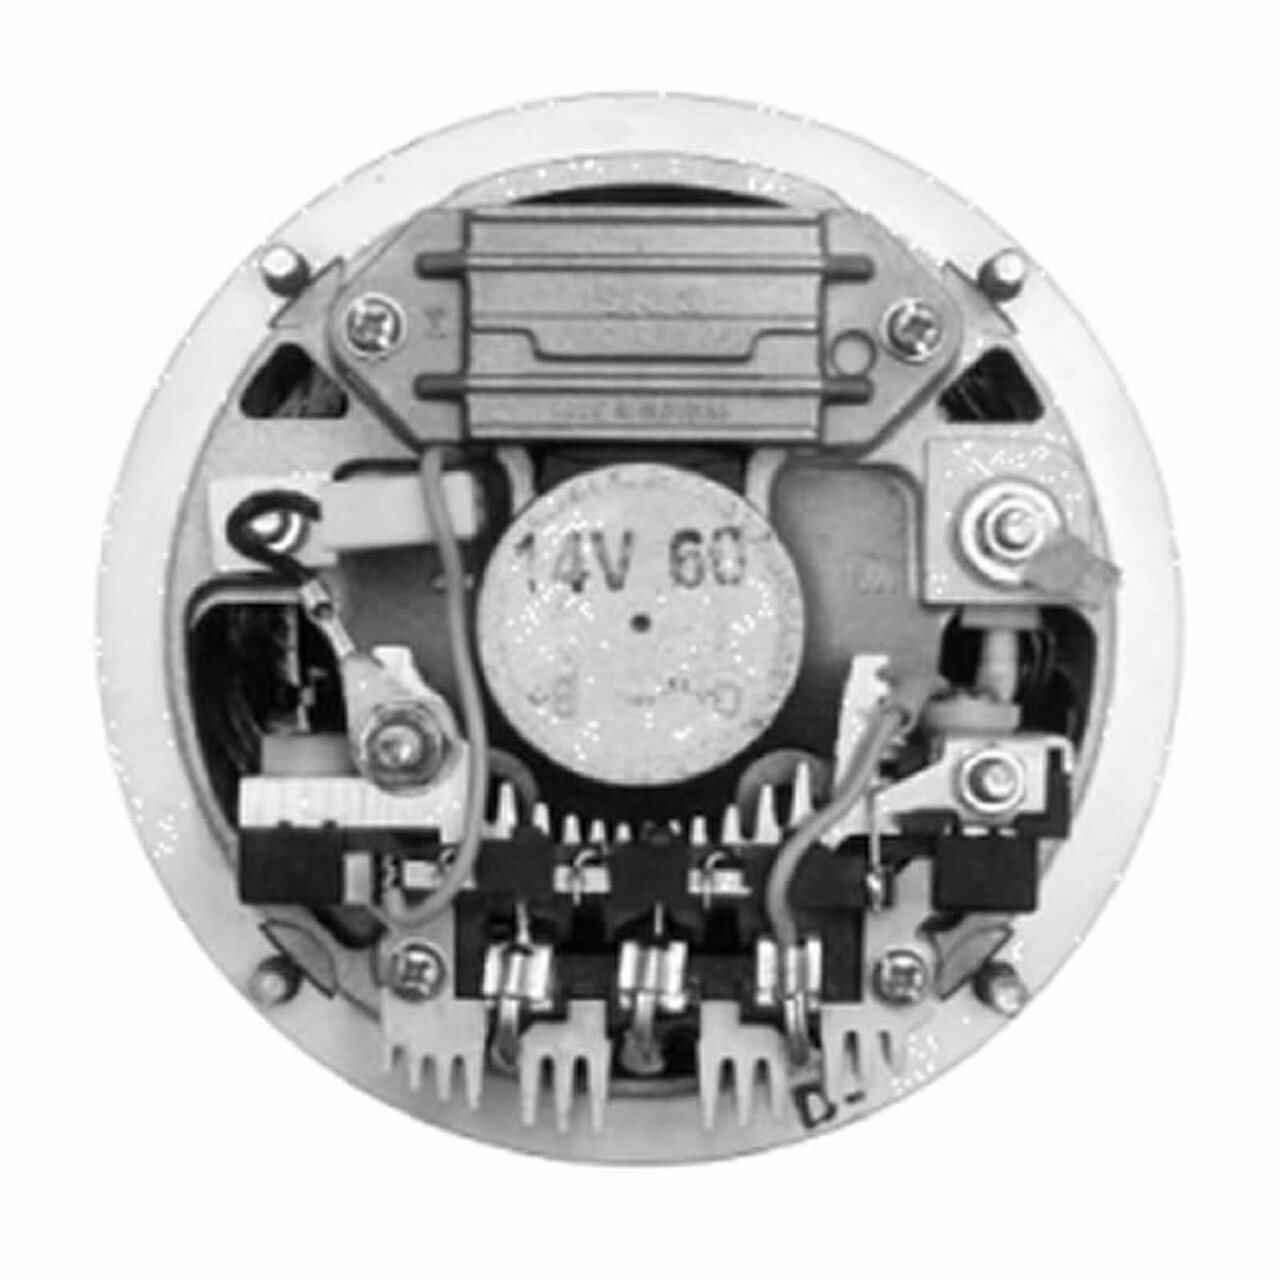 Letrika Alternator Wiring Diagram from cdn11.bigcommerce.com